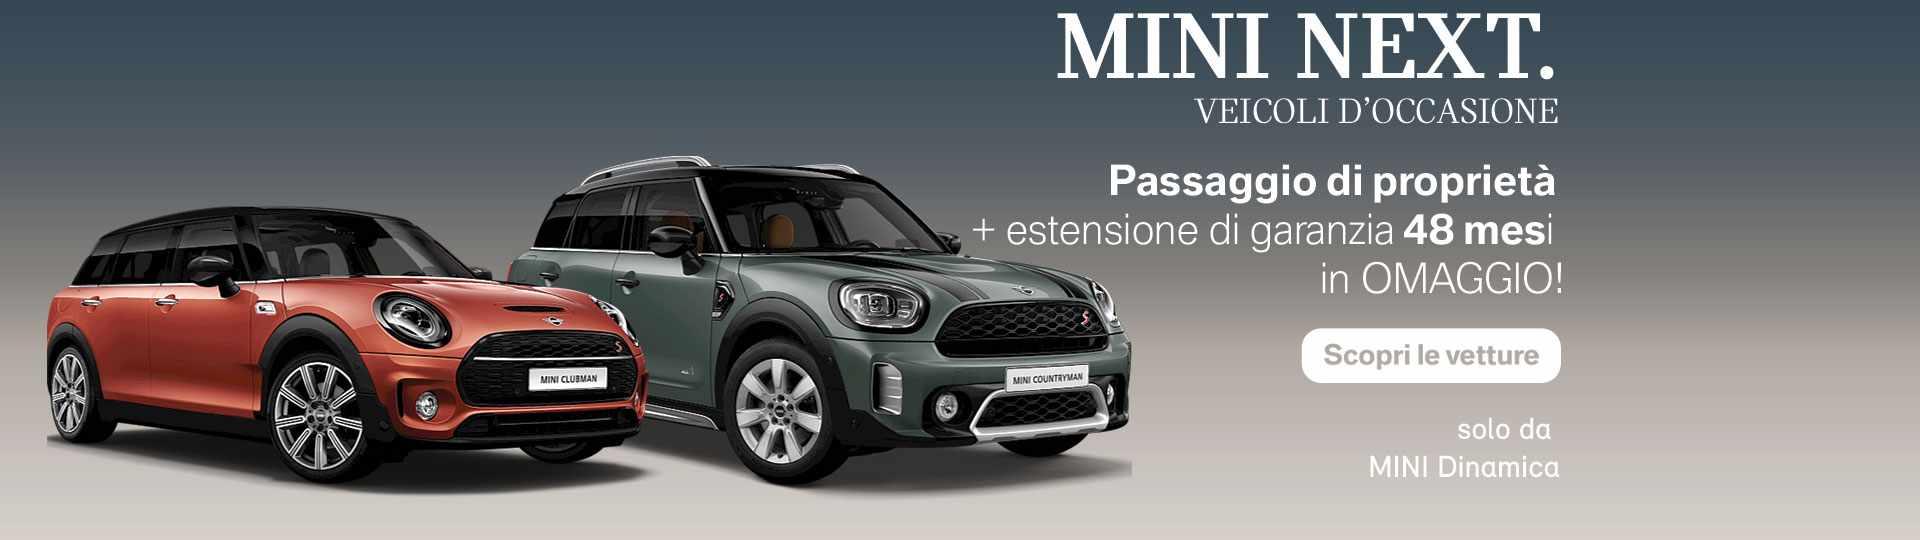 header_interna_mini_next_passaggio_febbraio_2021.jpg